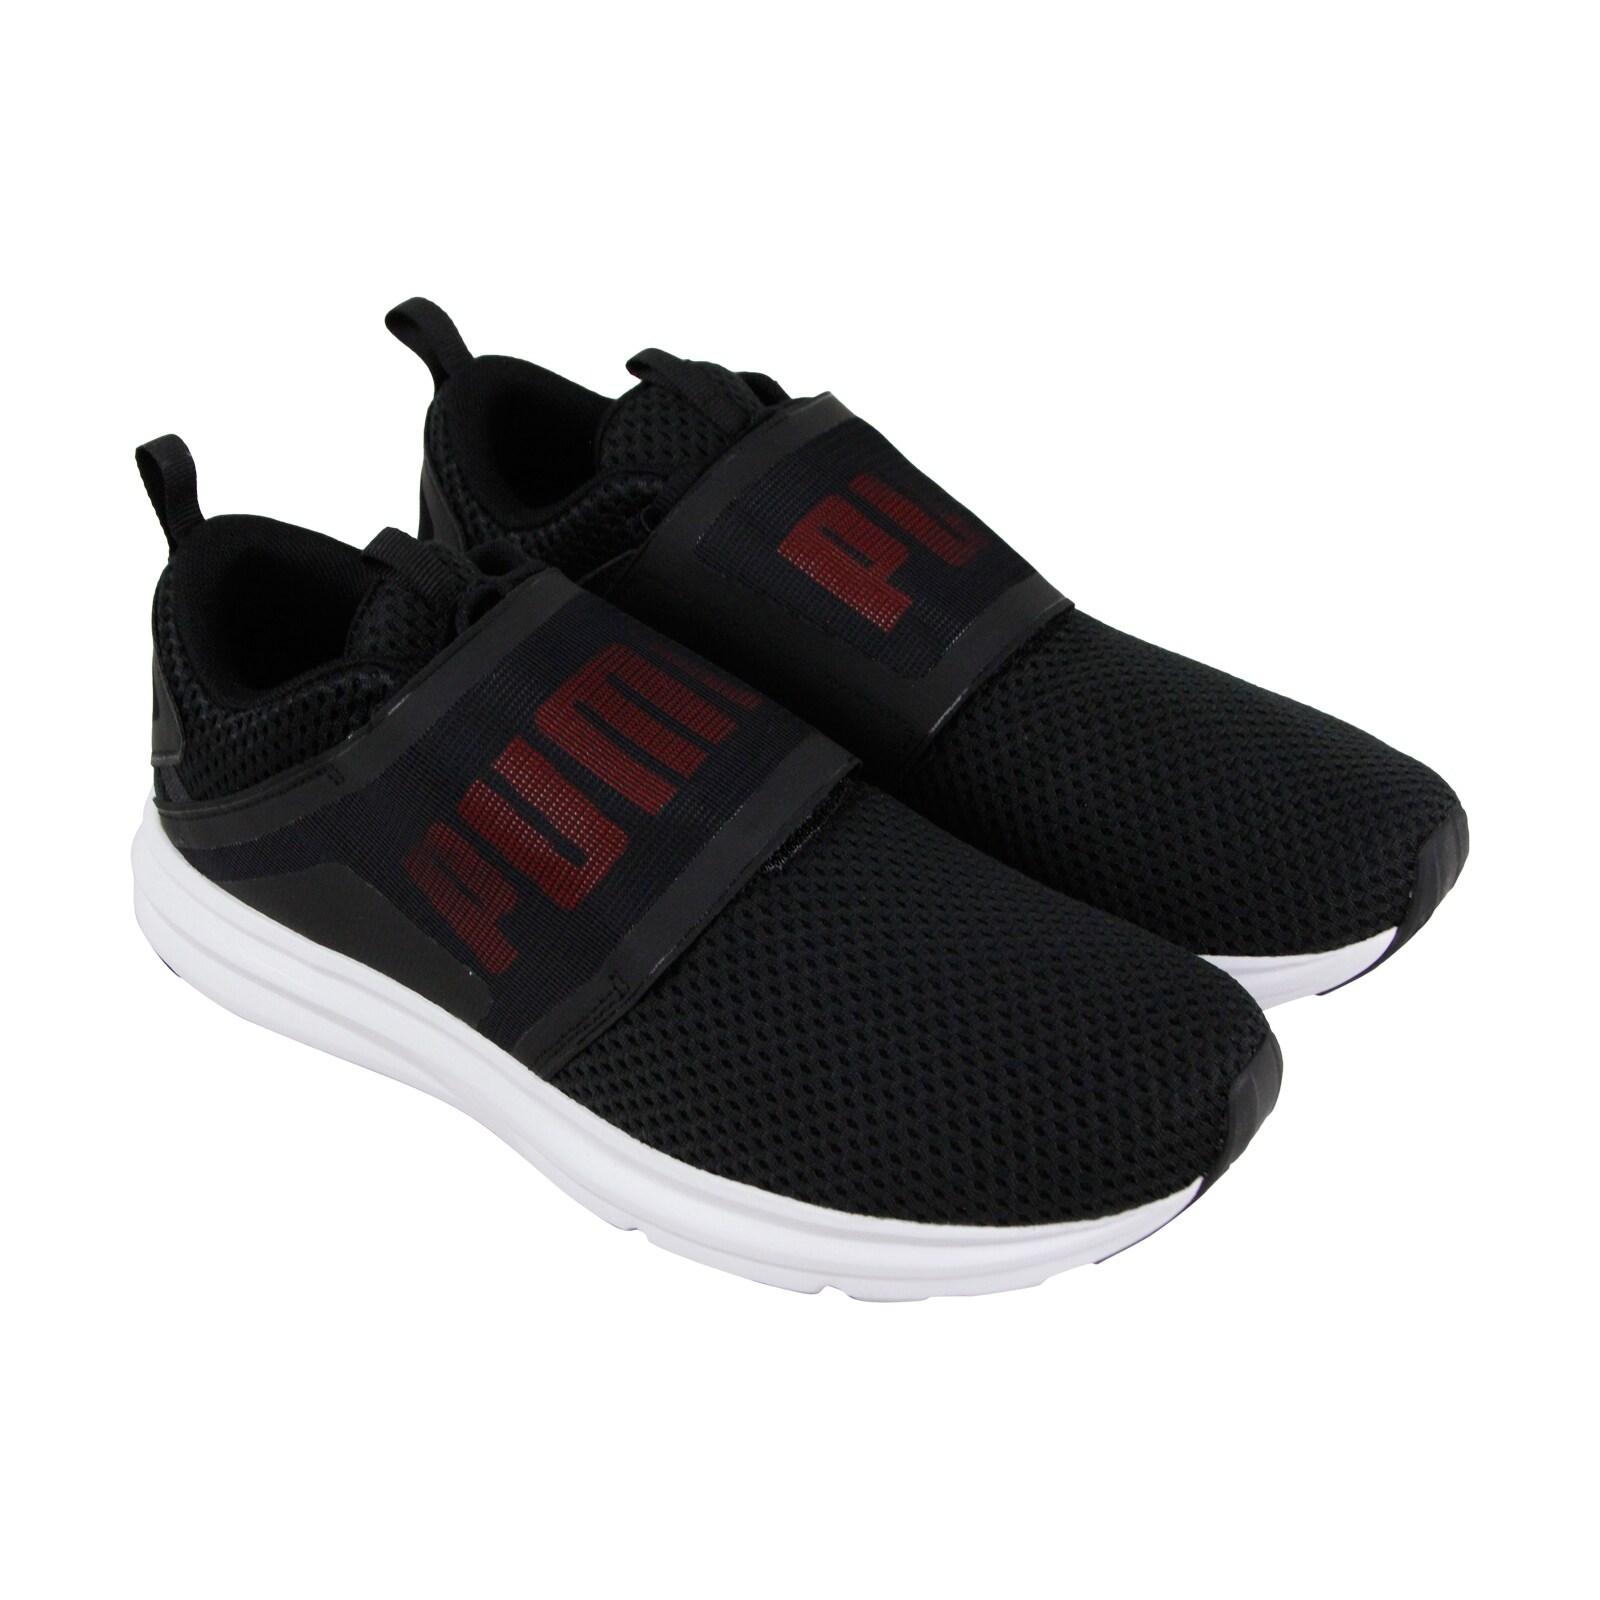 Shop Puma Enzo Strap Mens Black Mesh Athletic Strap Running Shoes ... 48b066d18